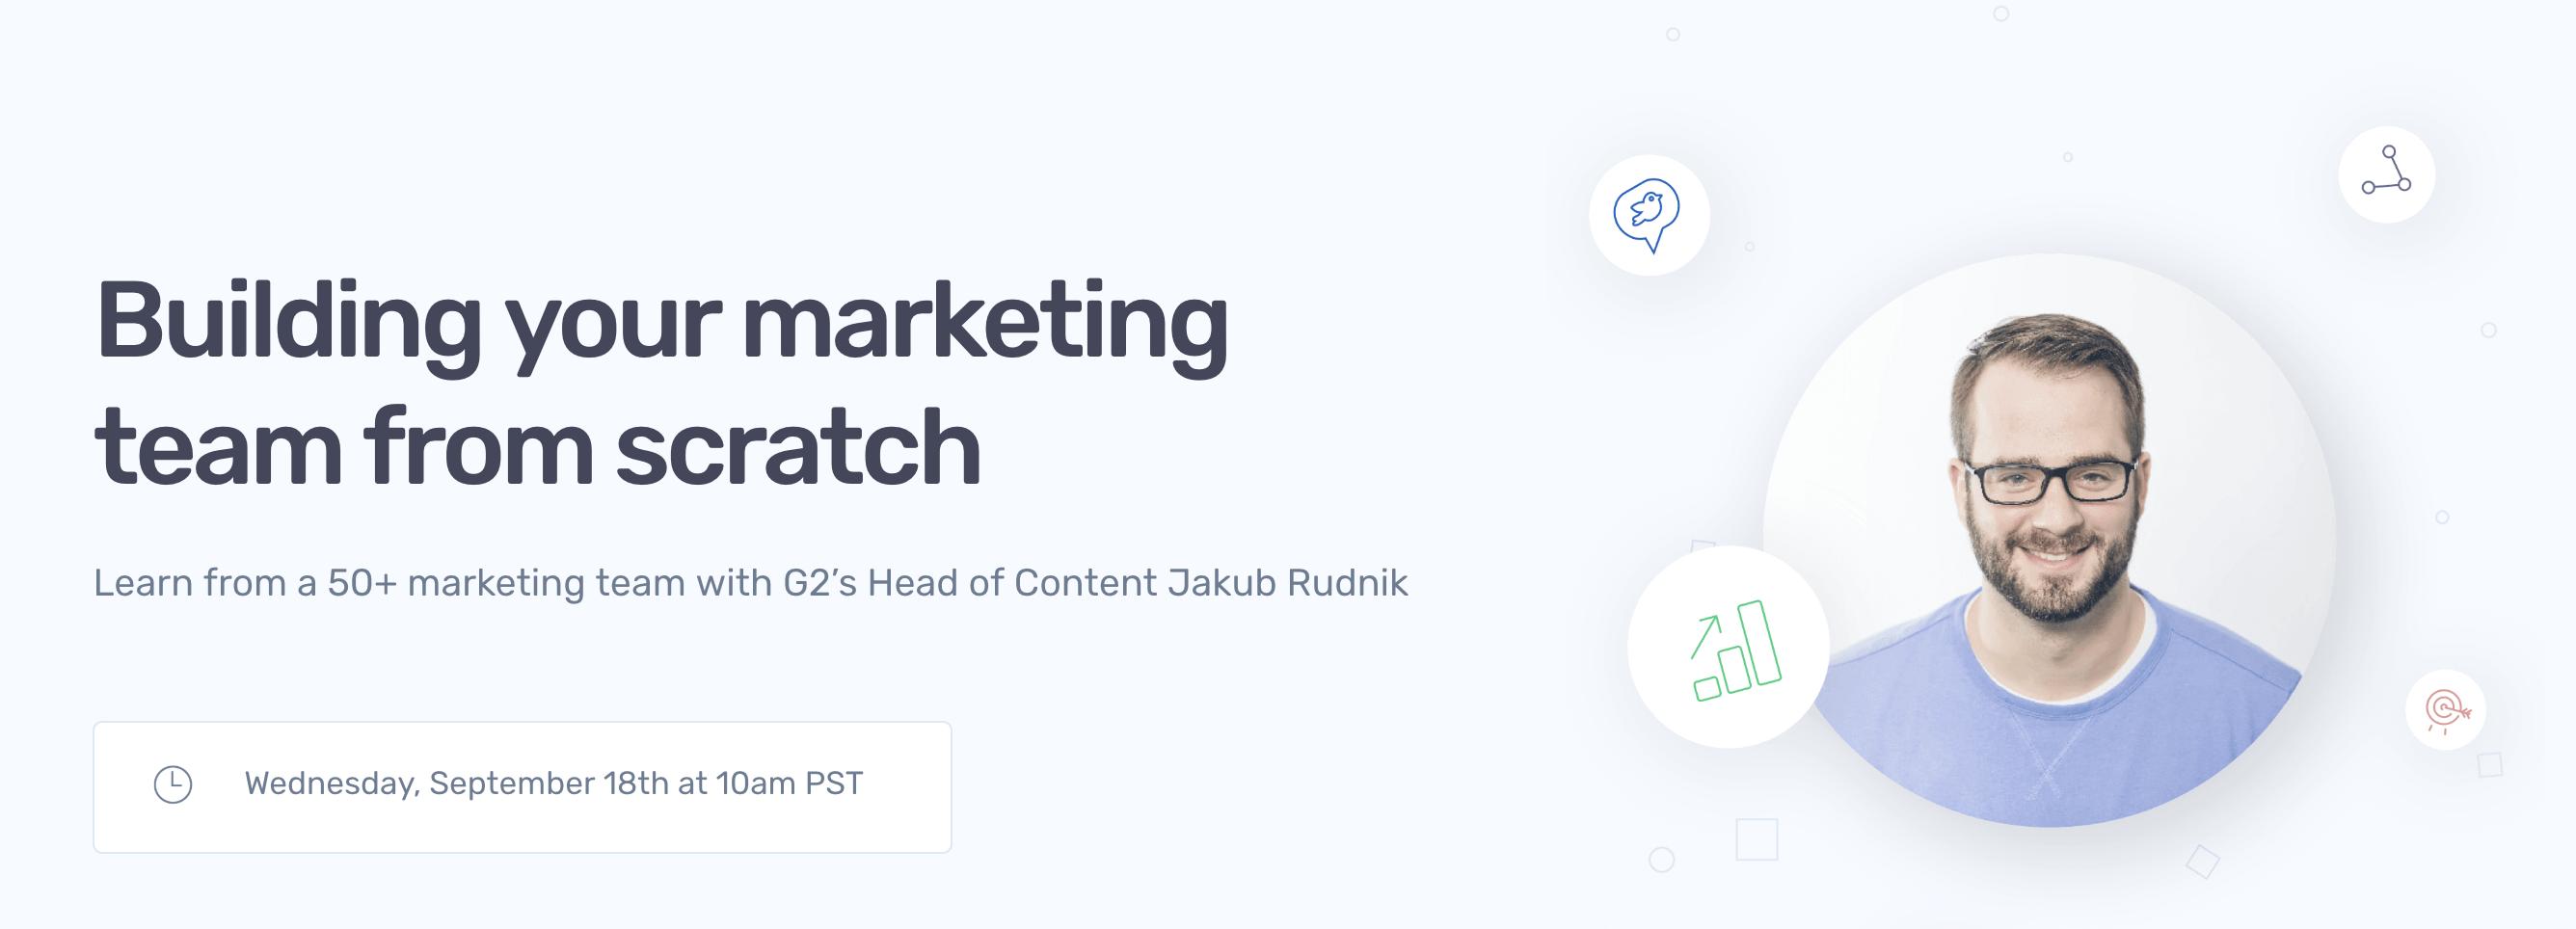 people of marketing webinar with Jakub Rudnik by planable